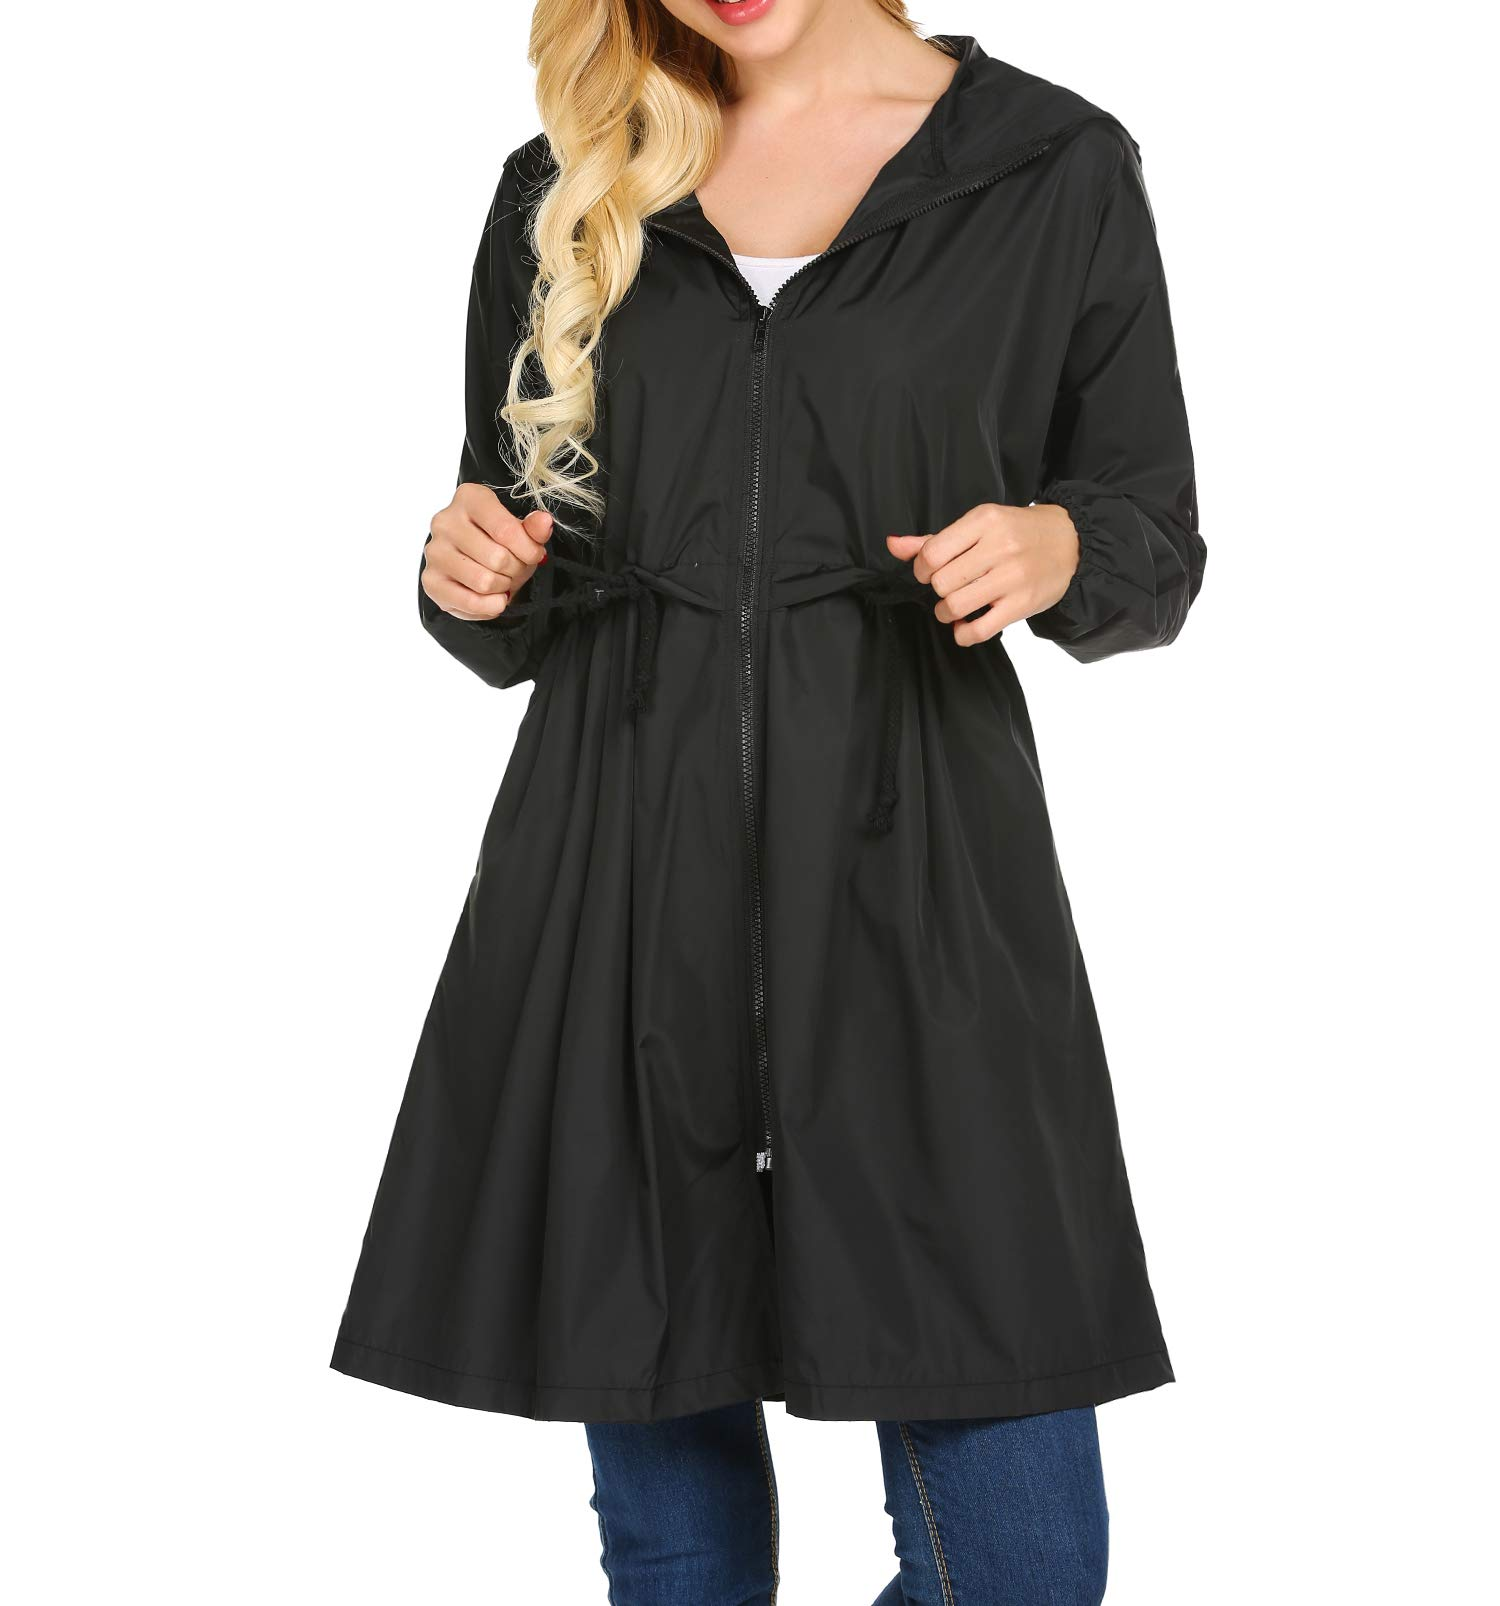 Mofavor Women's Hooded Long Sleeve Lightweight Waterproof Rain Jacket Raincoat Black M